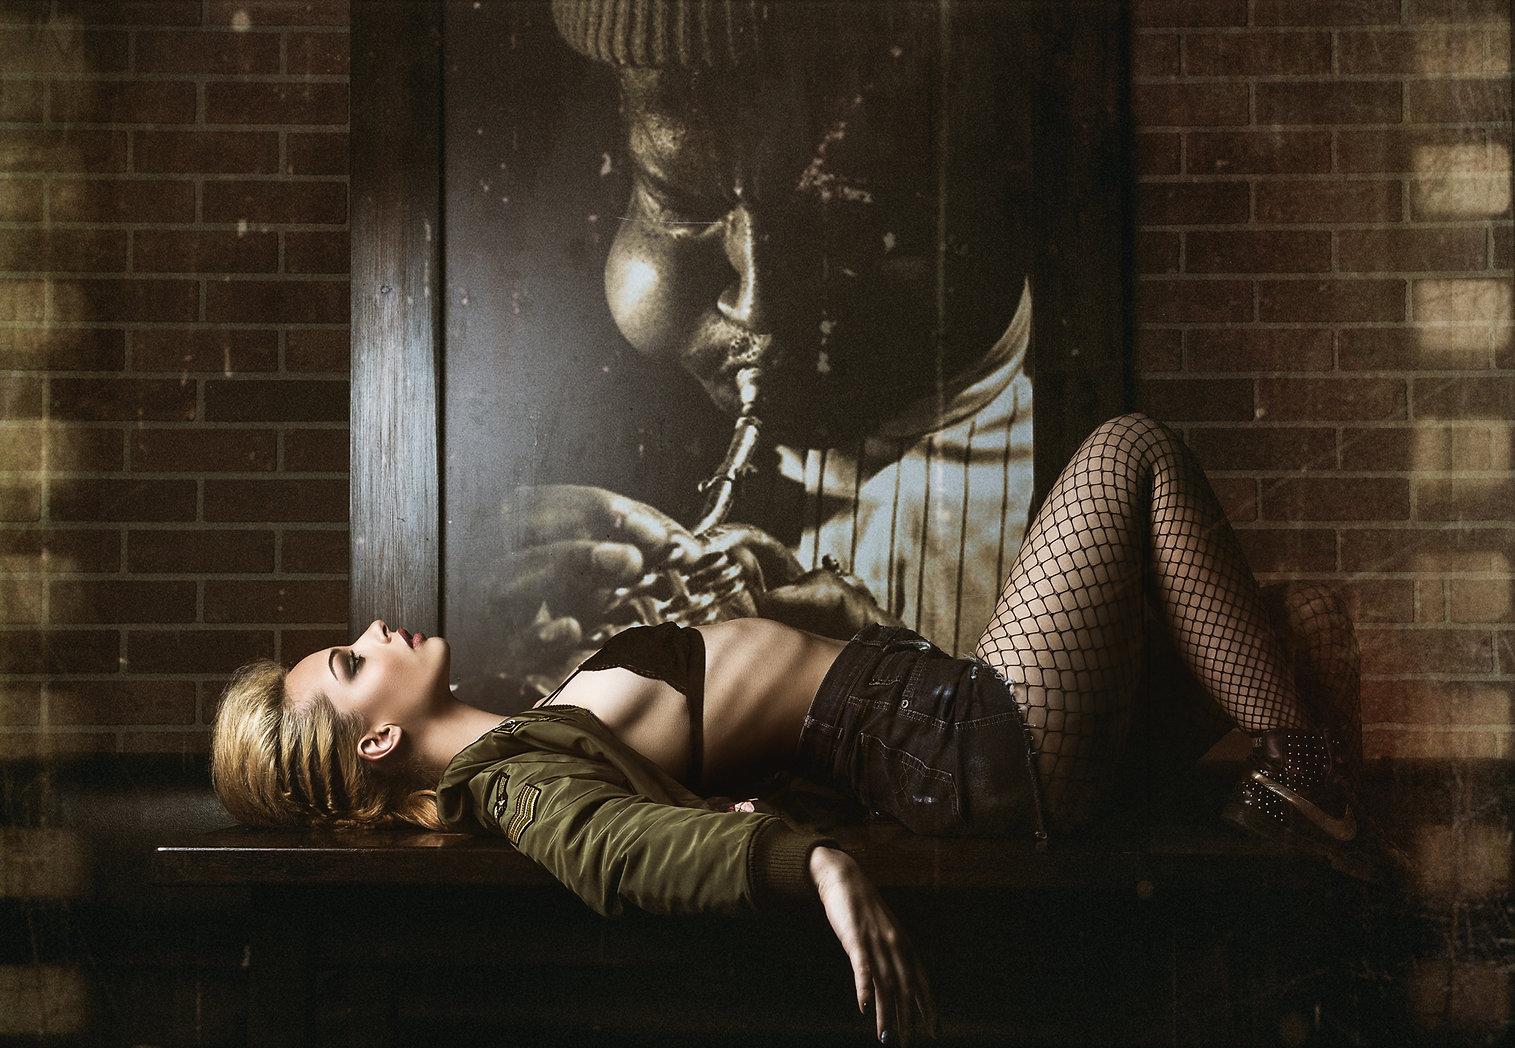 Bad Ass retro fashion photography projec